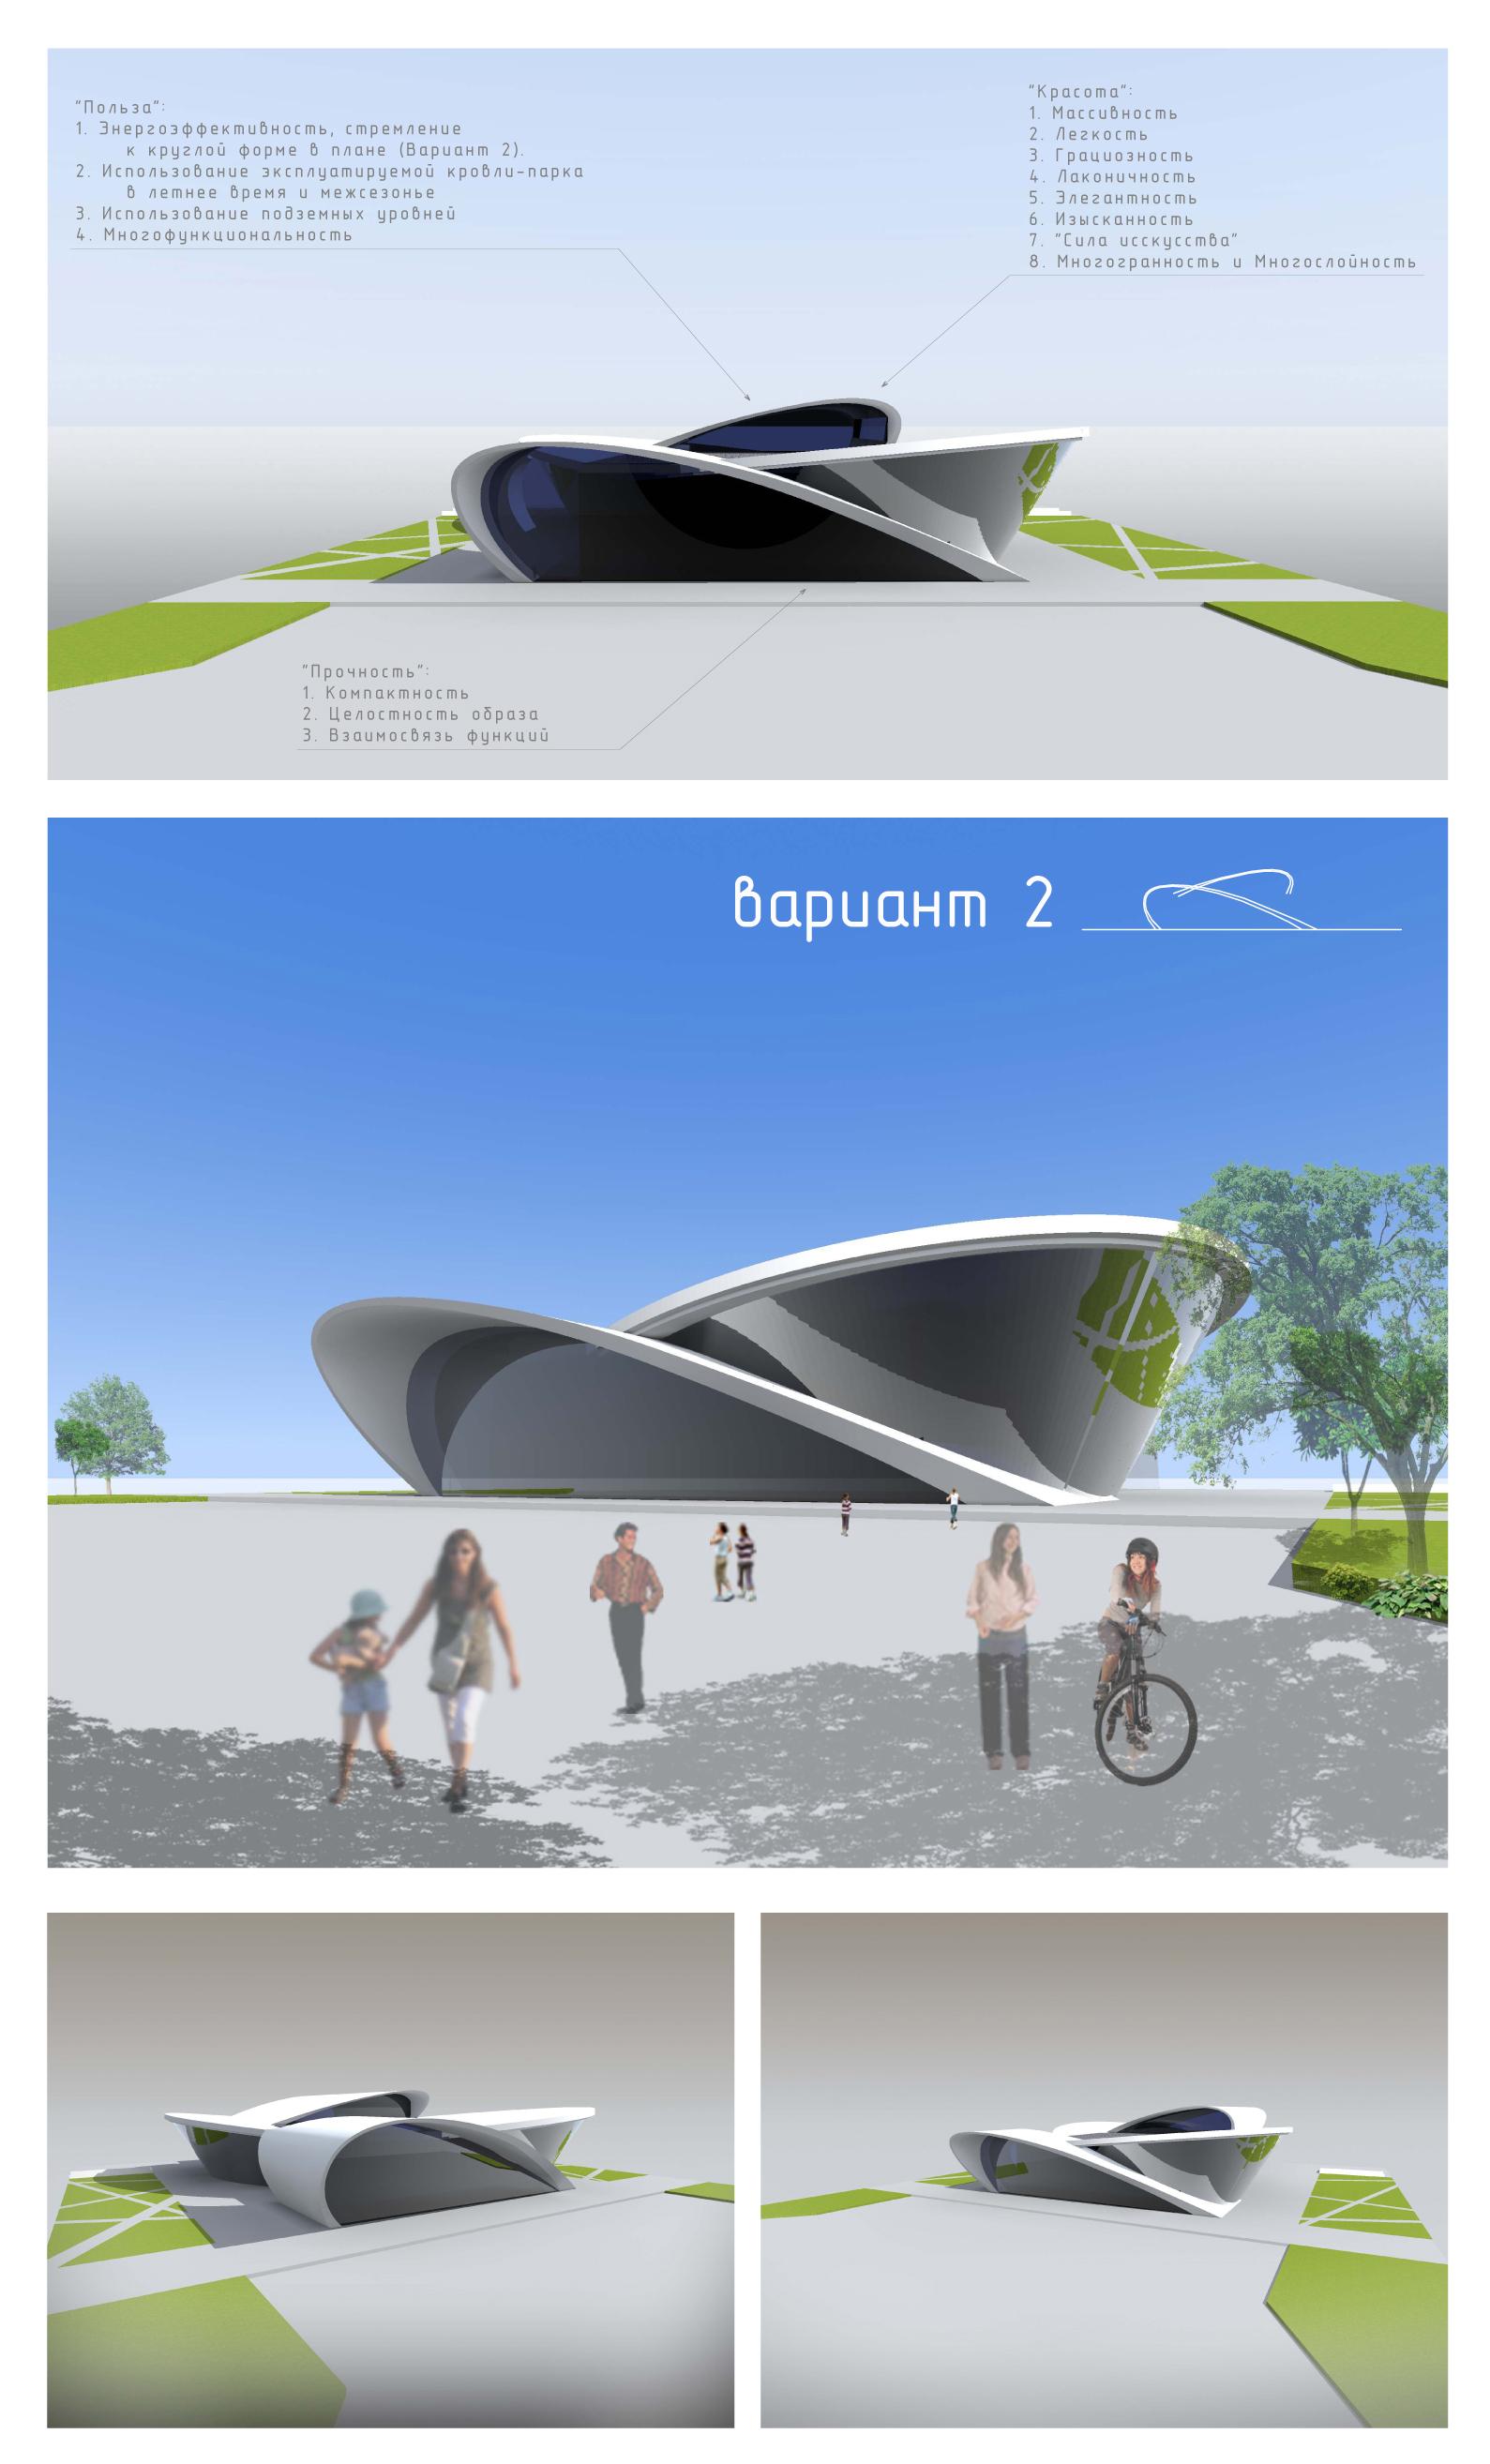 Разработка архитектурной концепции театра оперы и балета фото f_39052ede7197f791.jpg